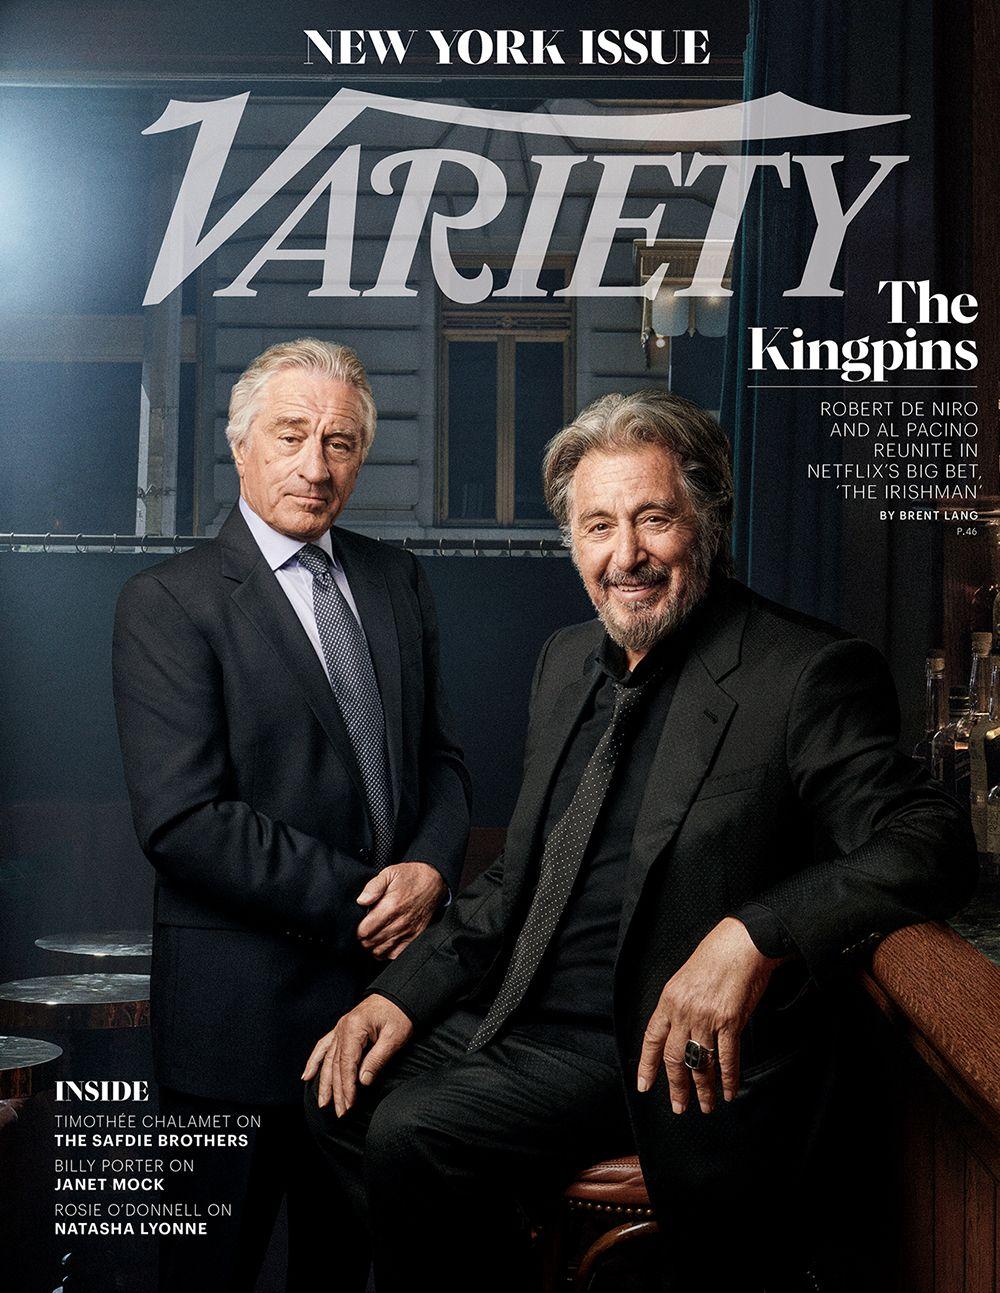 Robert De Niro And Al Pacino On Reuniting For Netflix S Costly